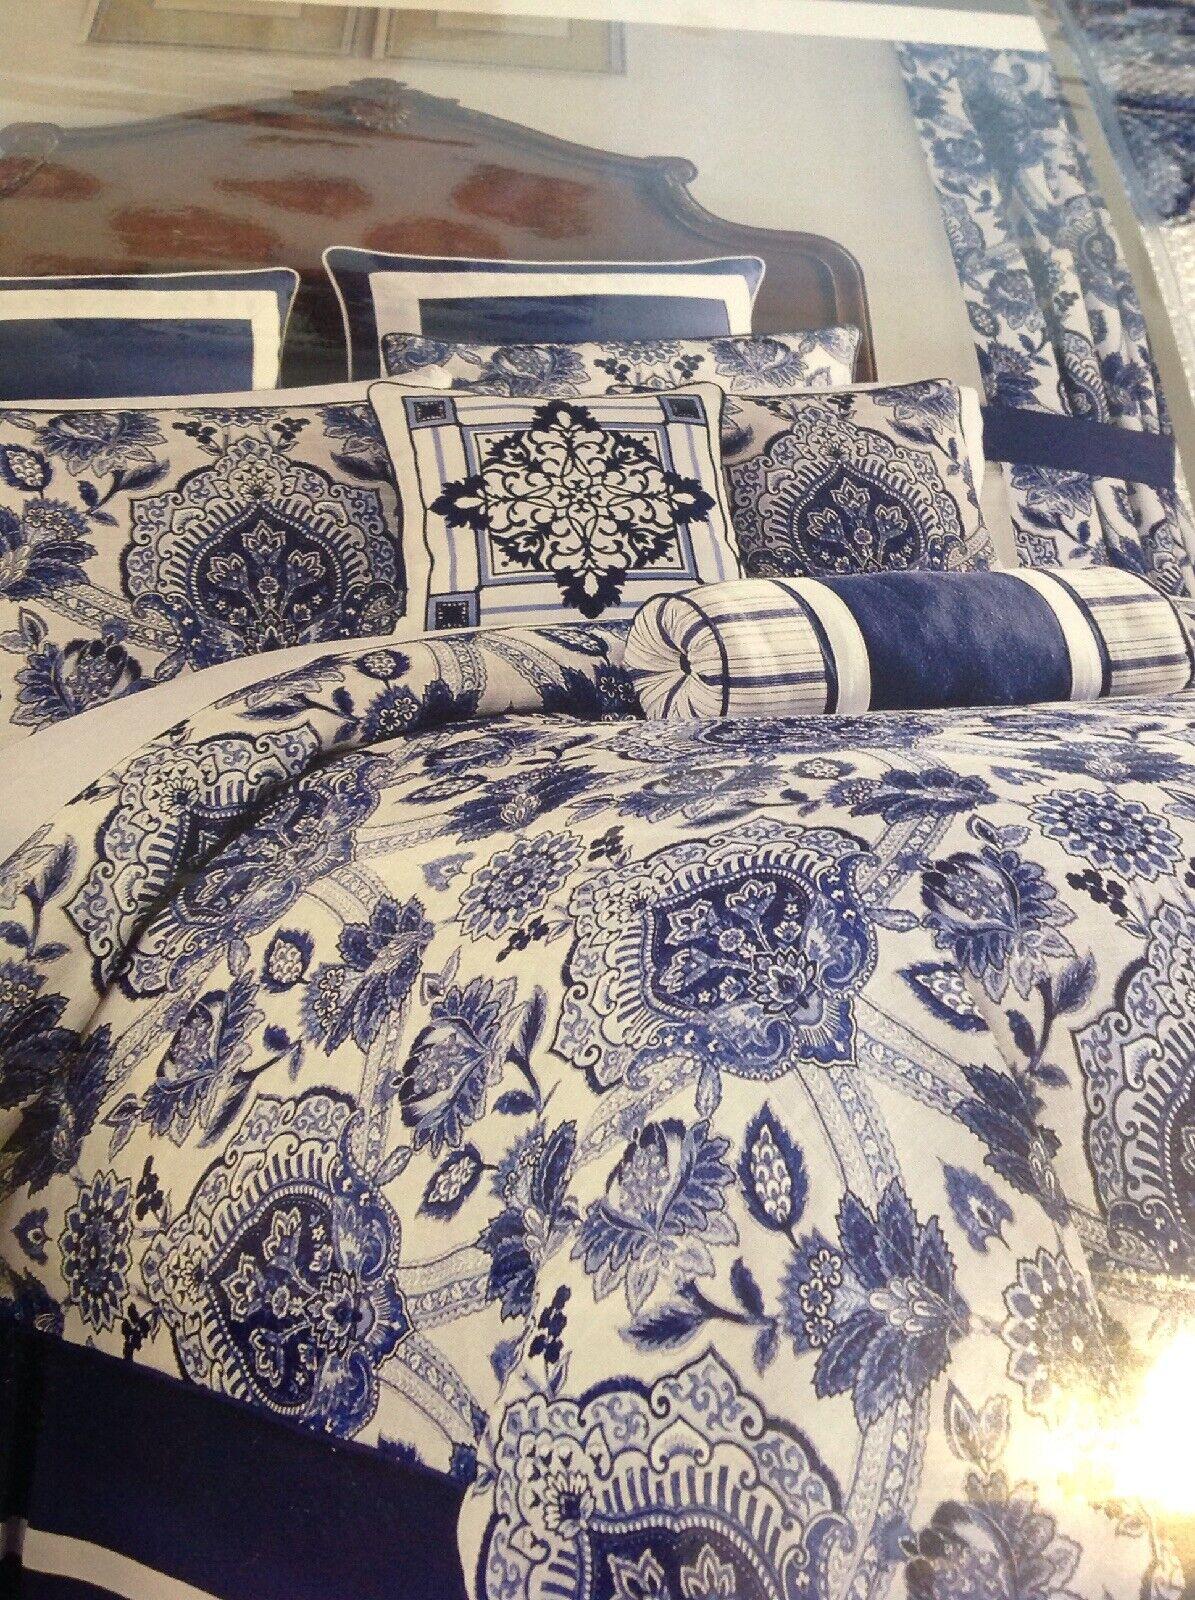 Croscill Leland King Comforter Set, 4 Piece, NIP